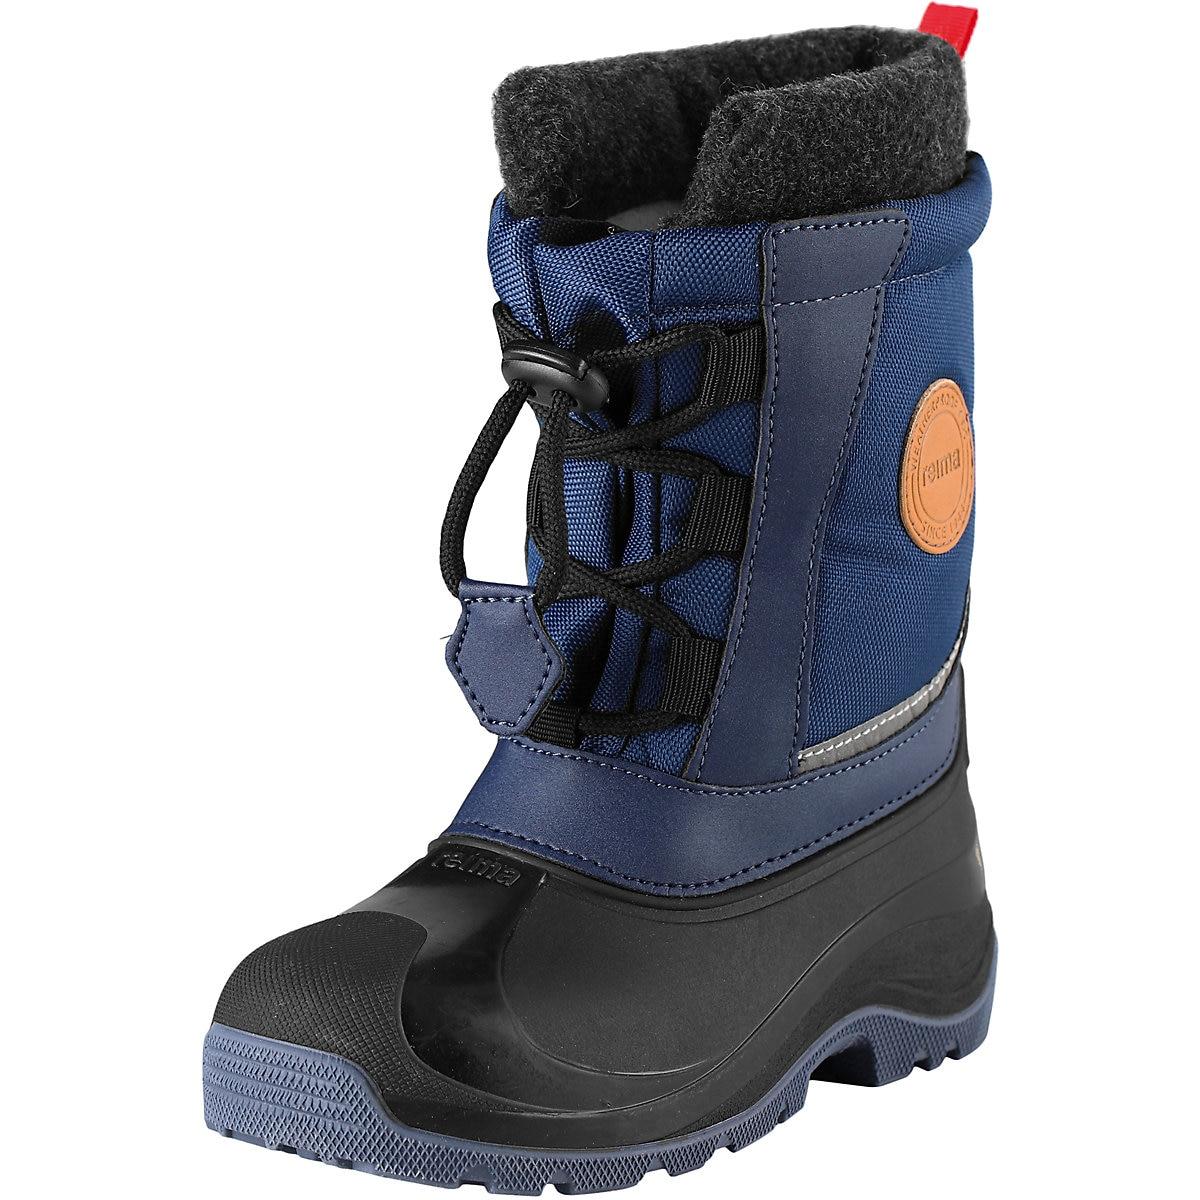 REIMA Boots 8624895 for boys winter boy  children shoes reima boots 8624963 for boys winter boy baby shoes